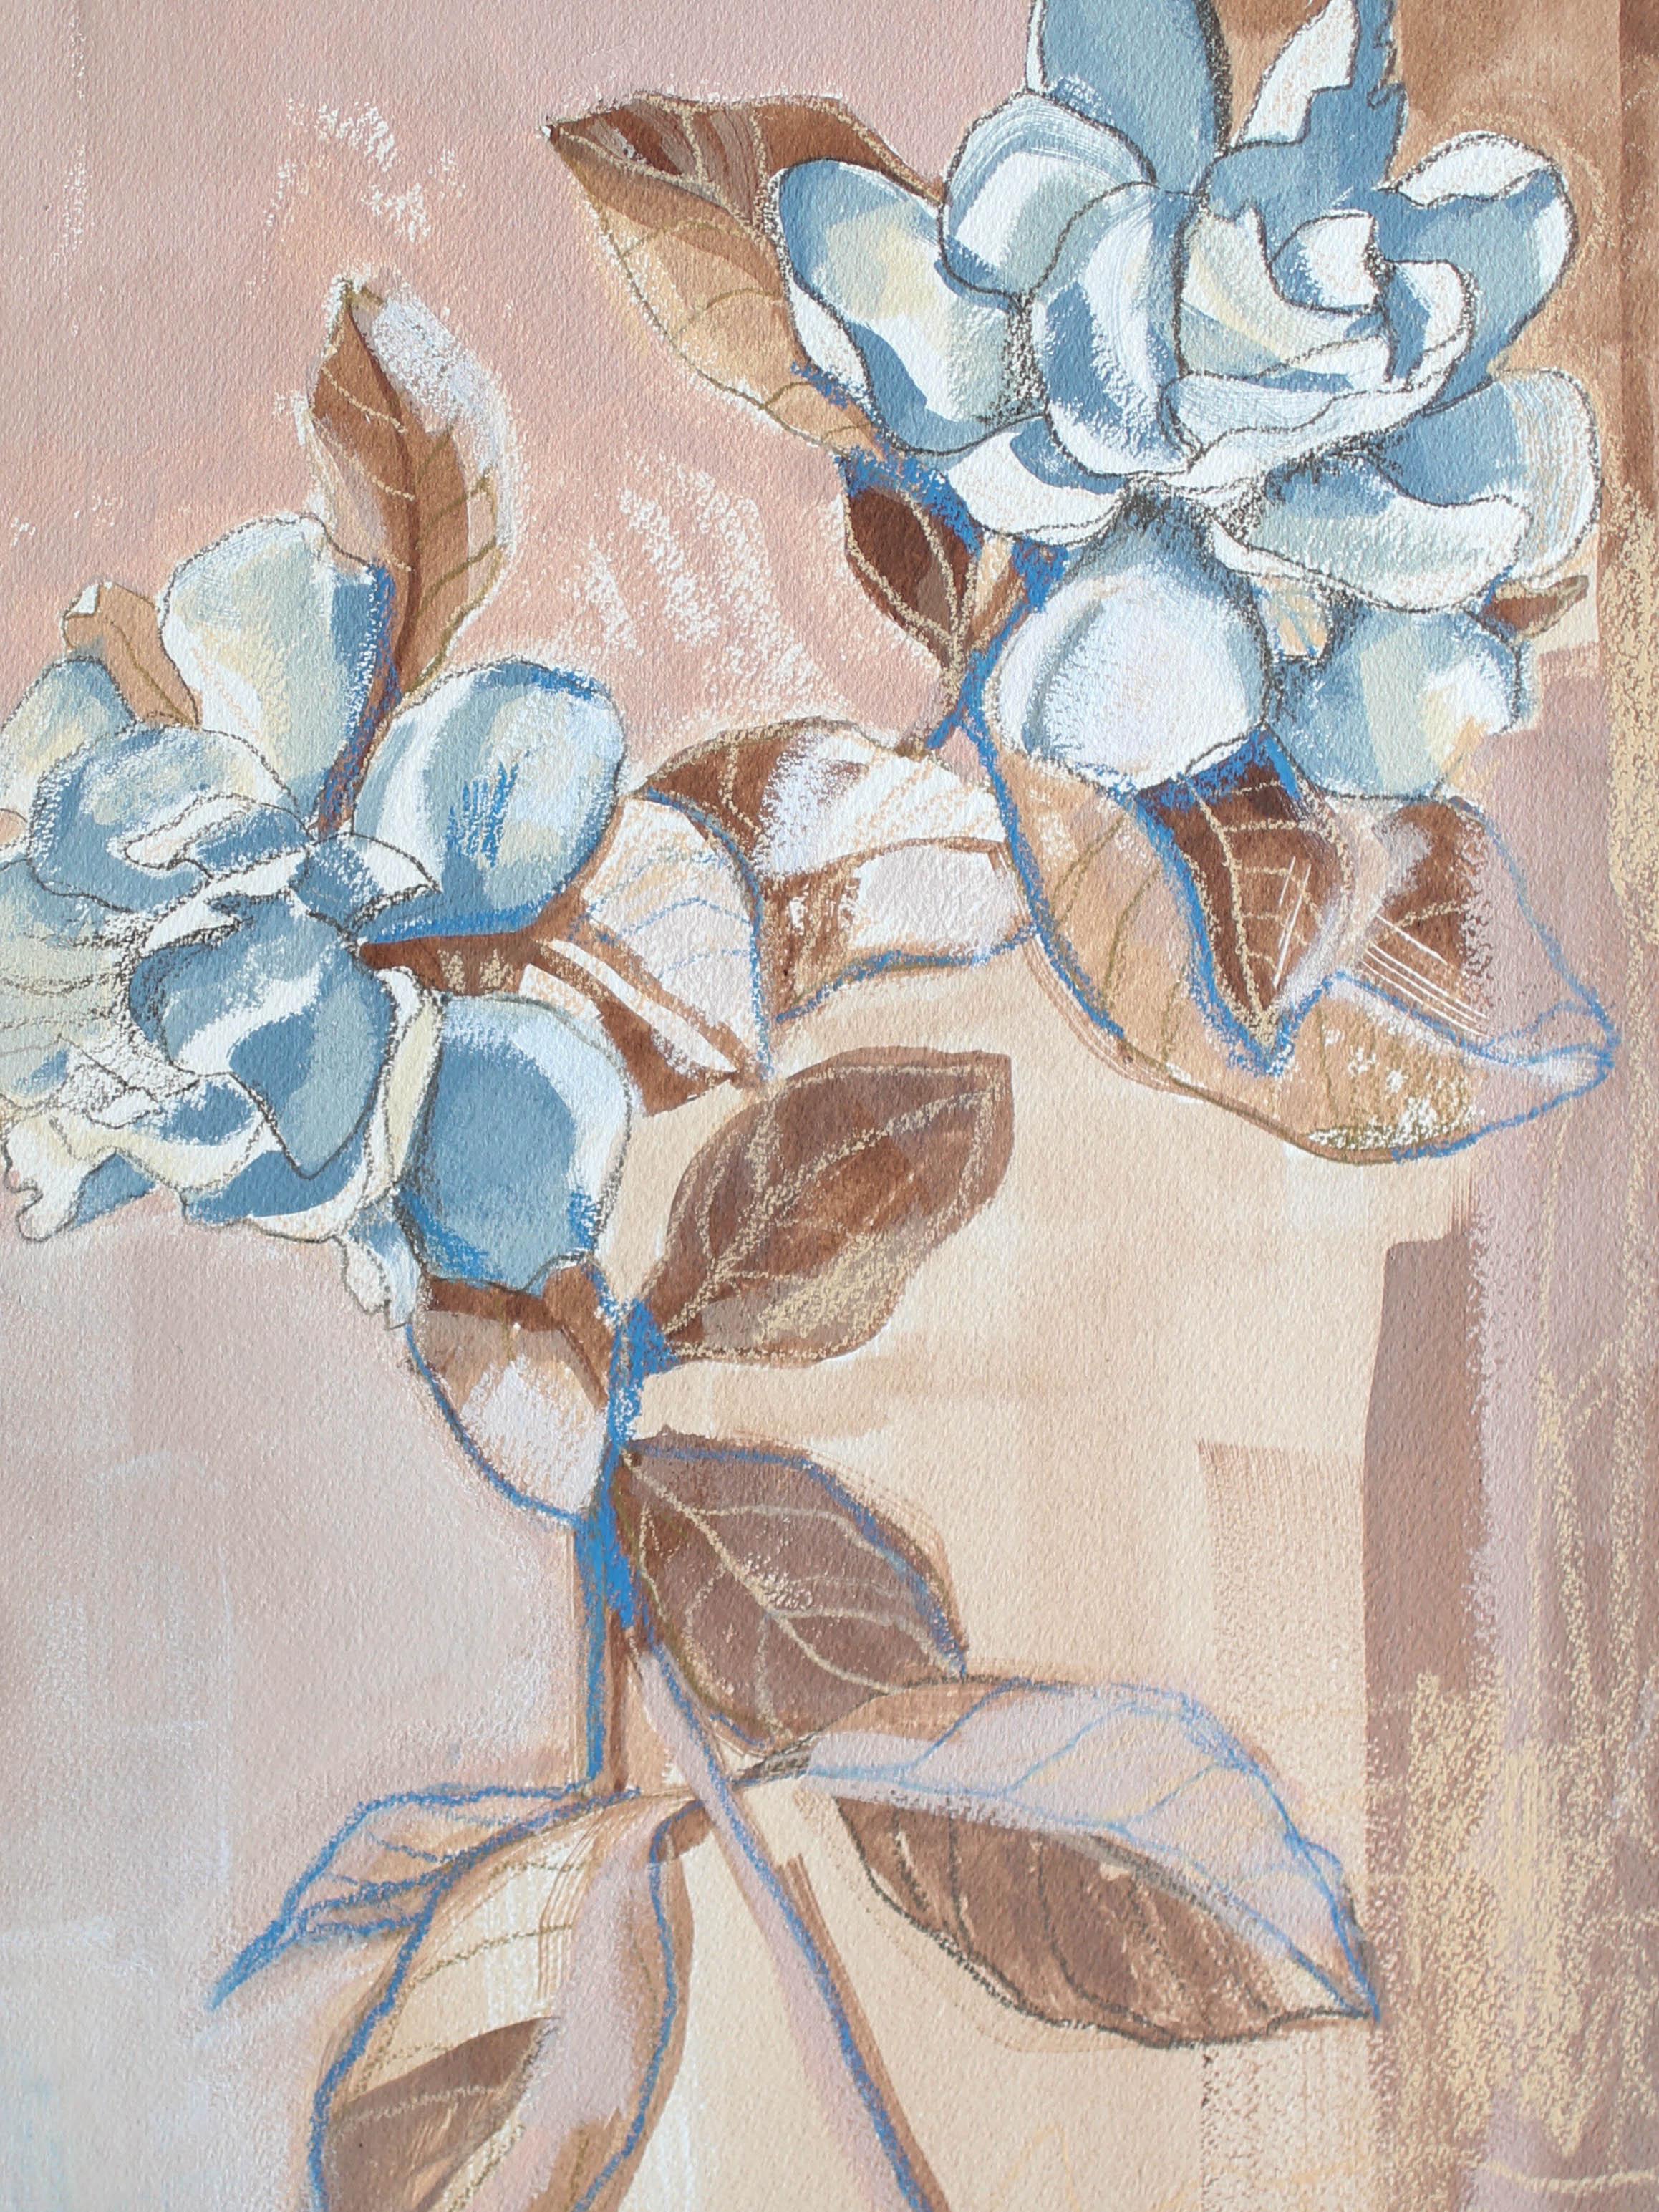 Gardenias for Caitlin - Caitlin Brown X Katherine Corden Art